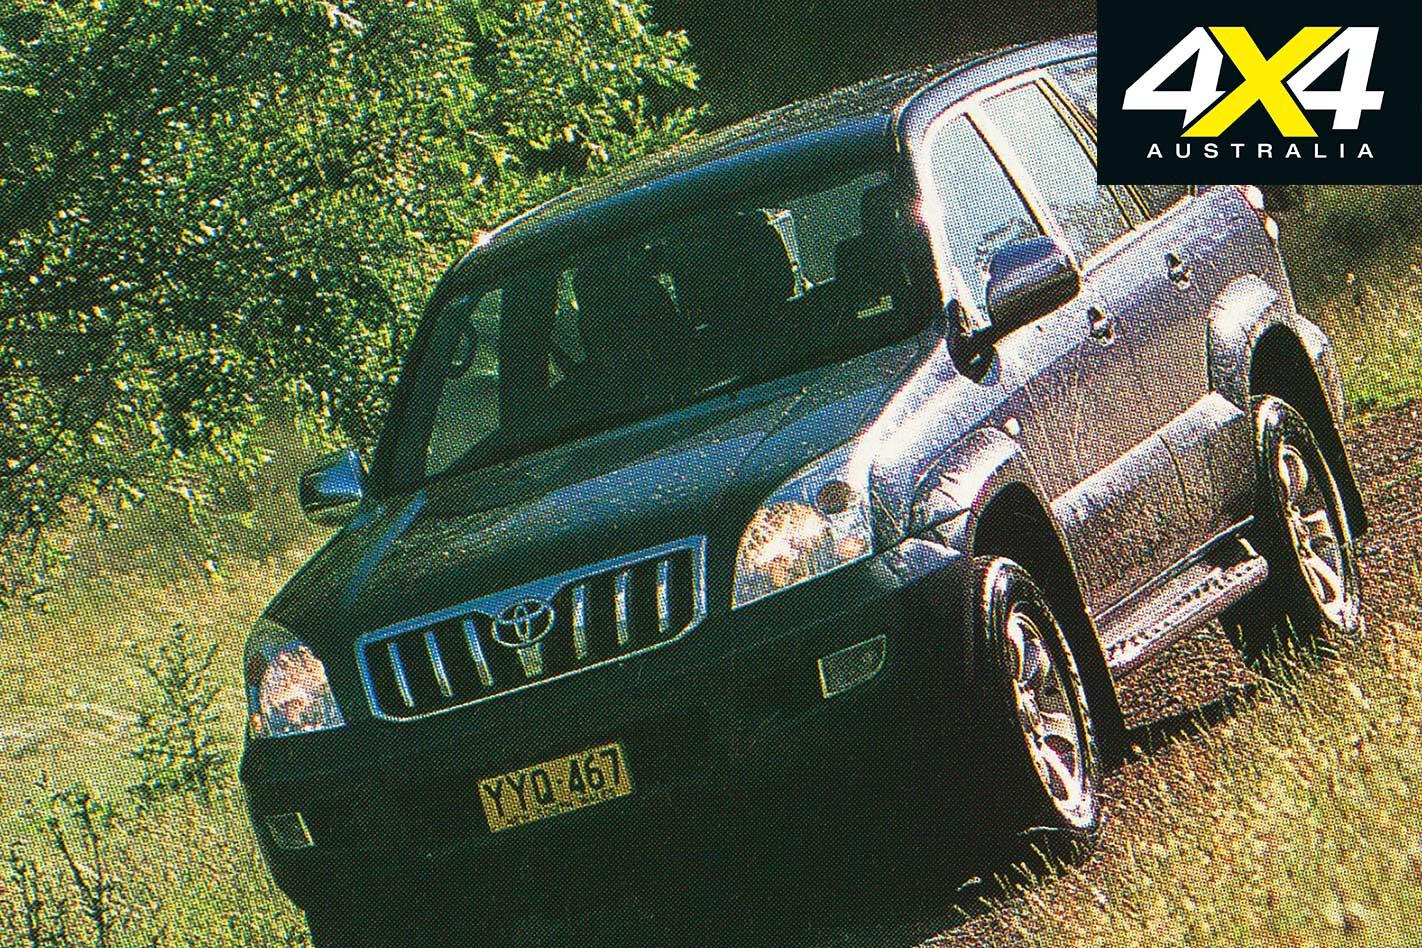 2004 Toyota Prado GXL Turbo Diesel Jpg